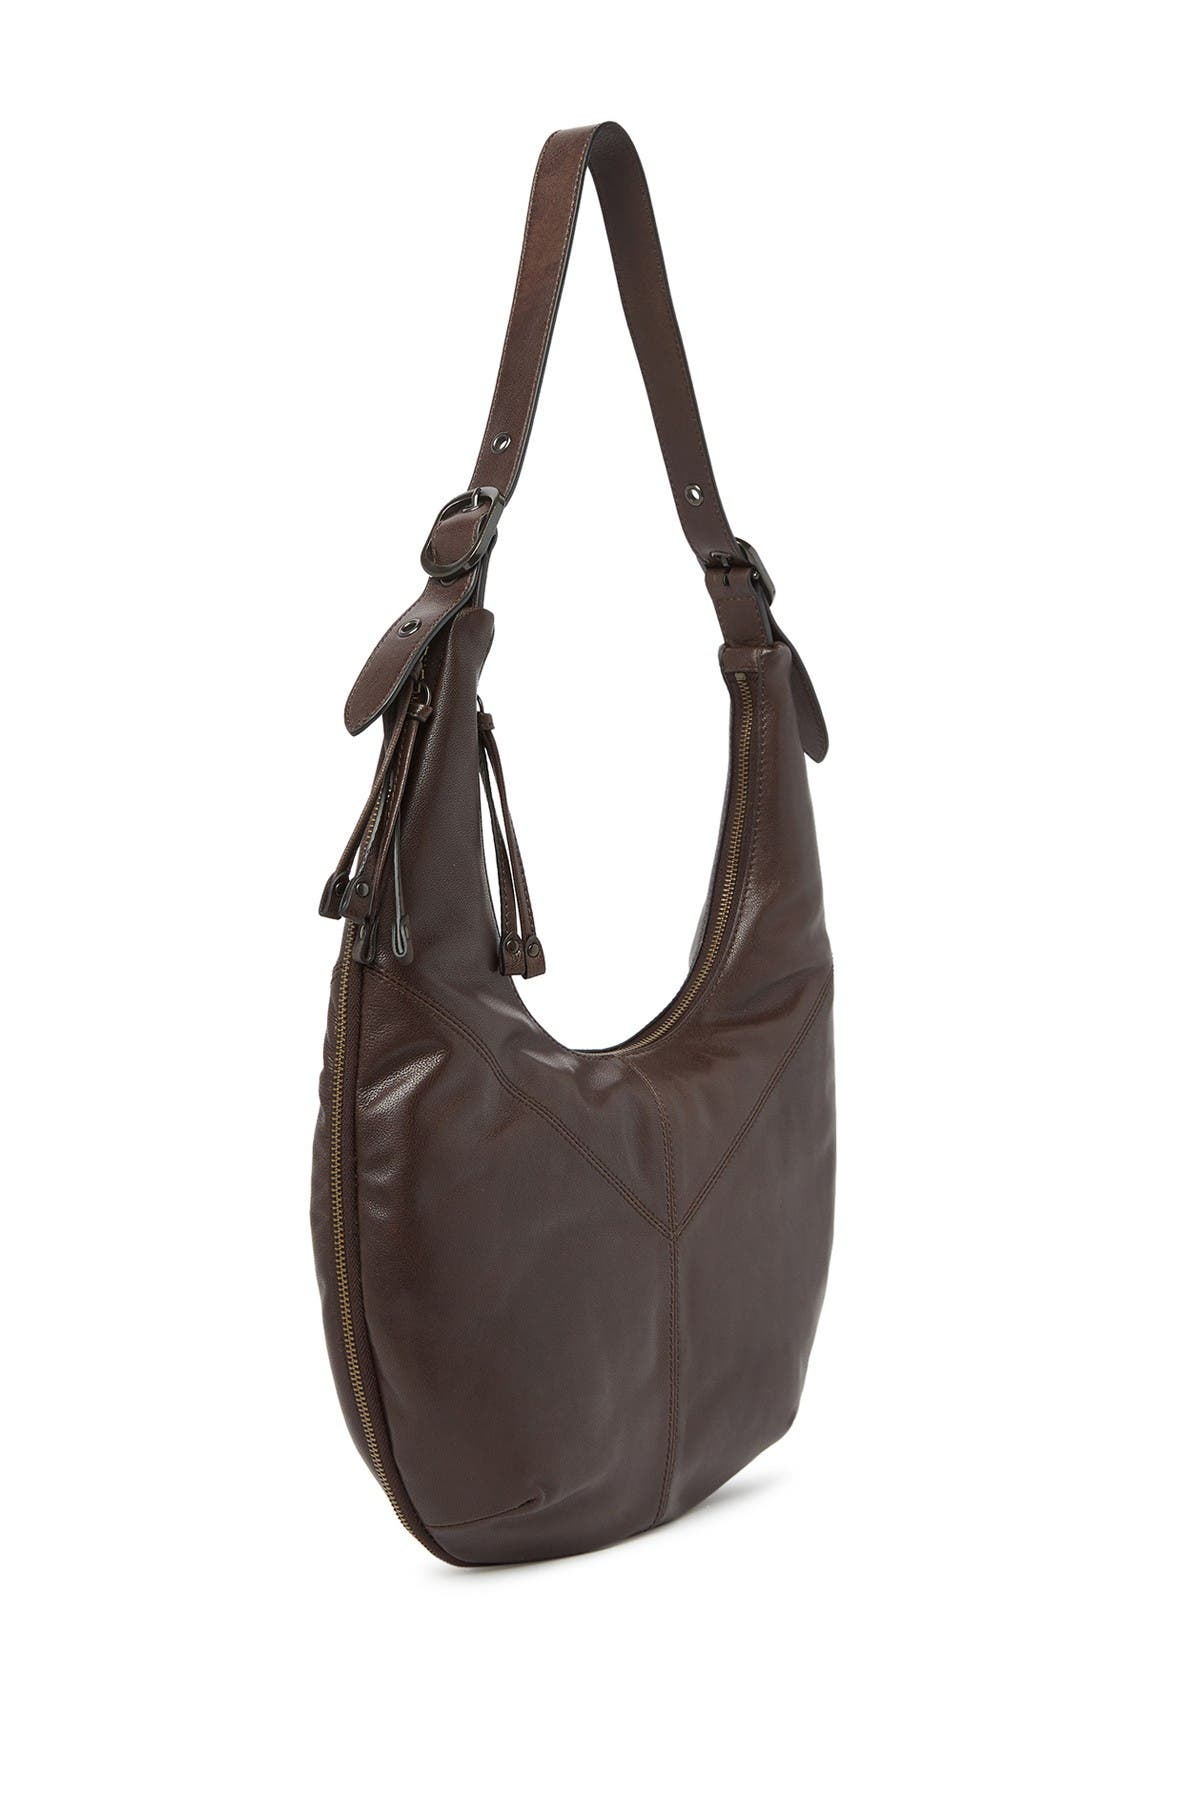 Image of Frye Gina Leather Hobo Bag